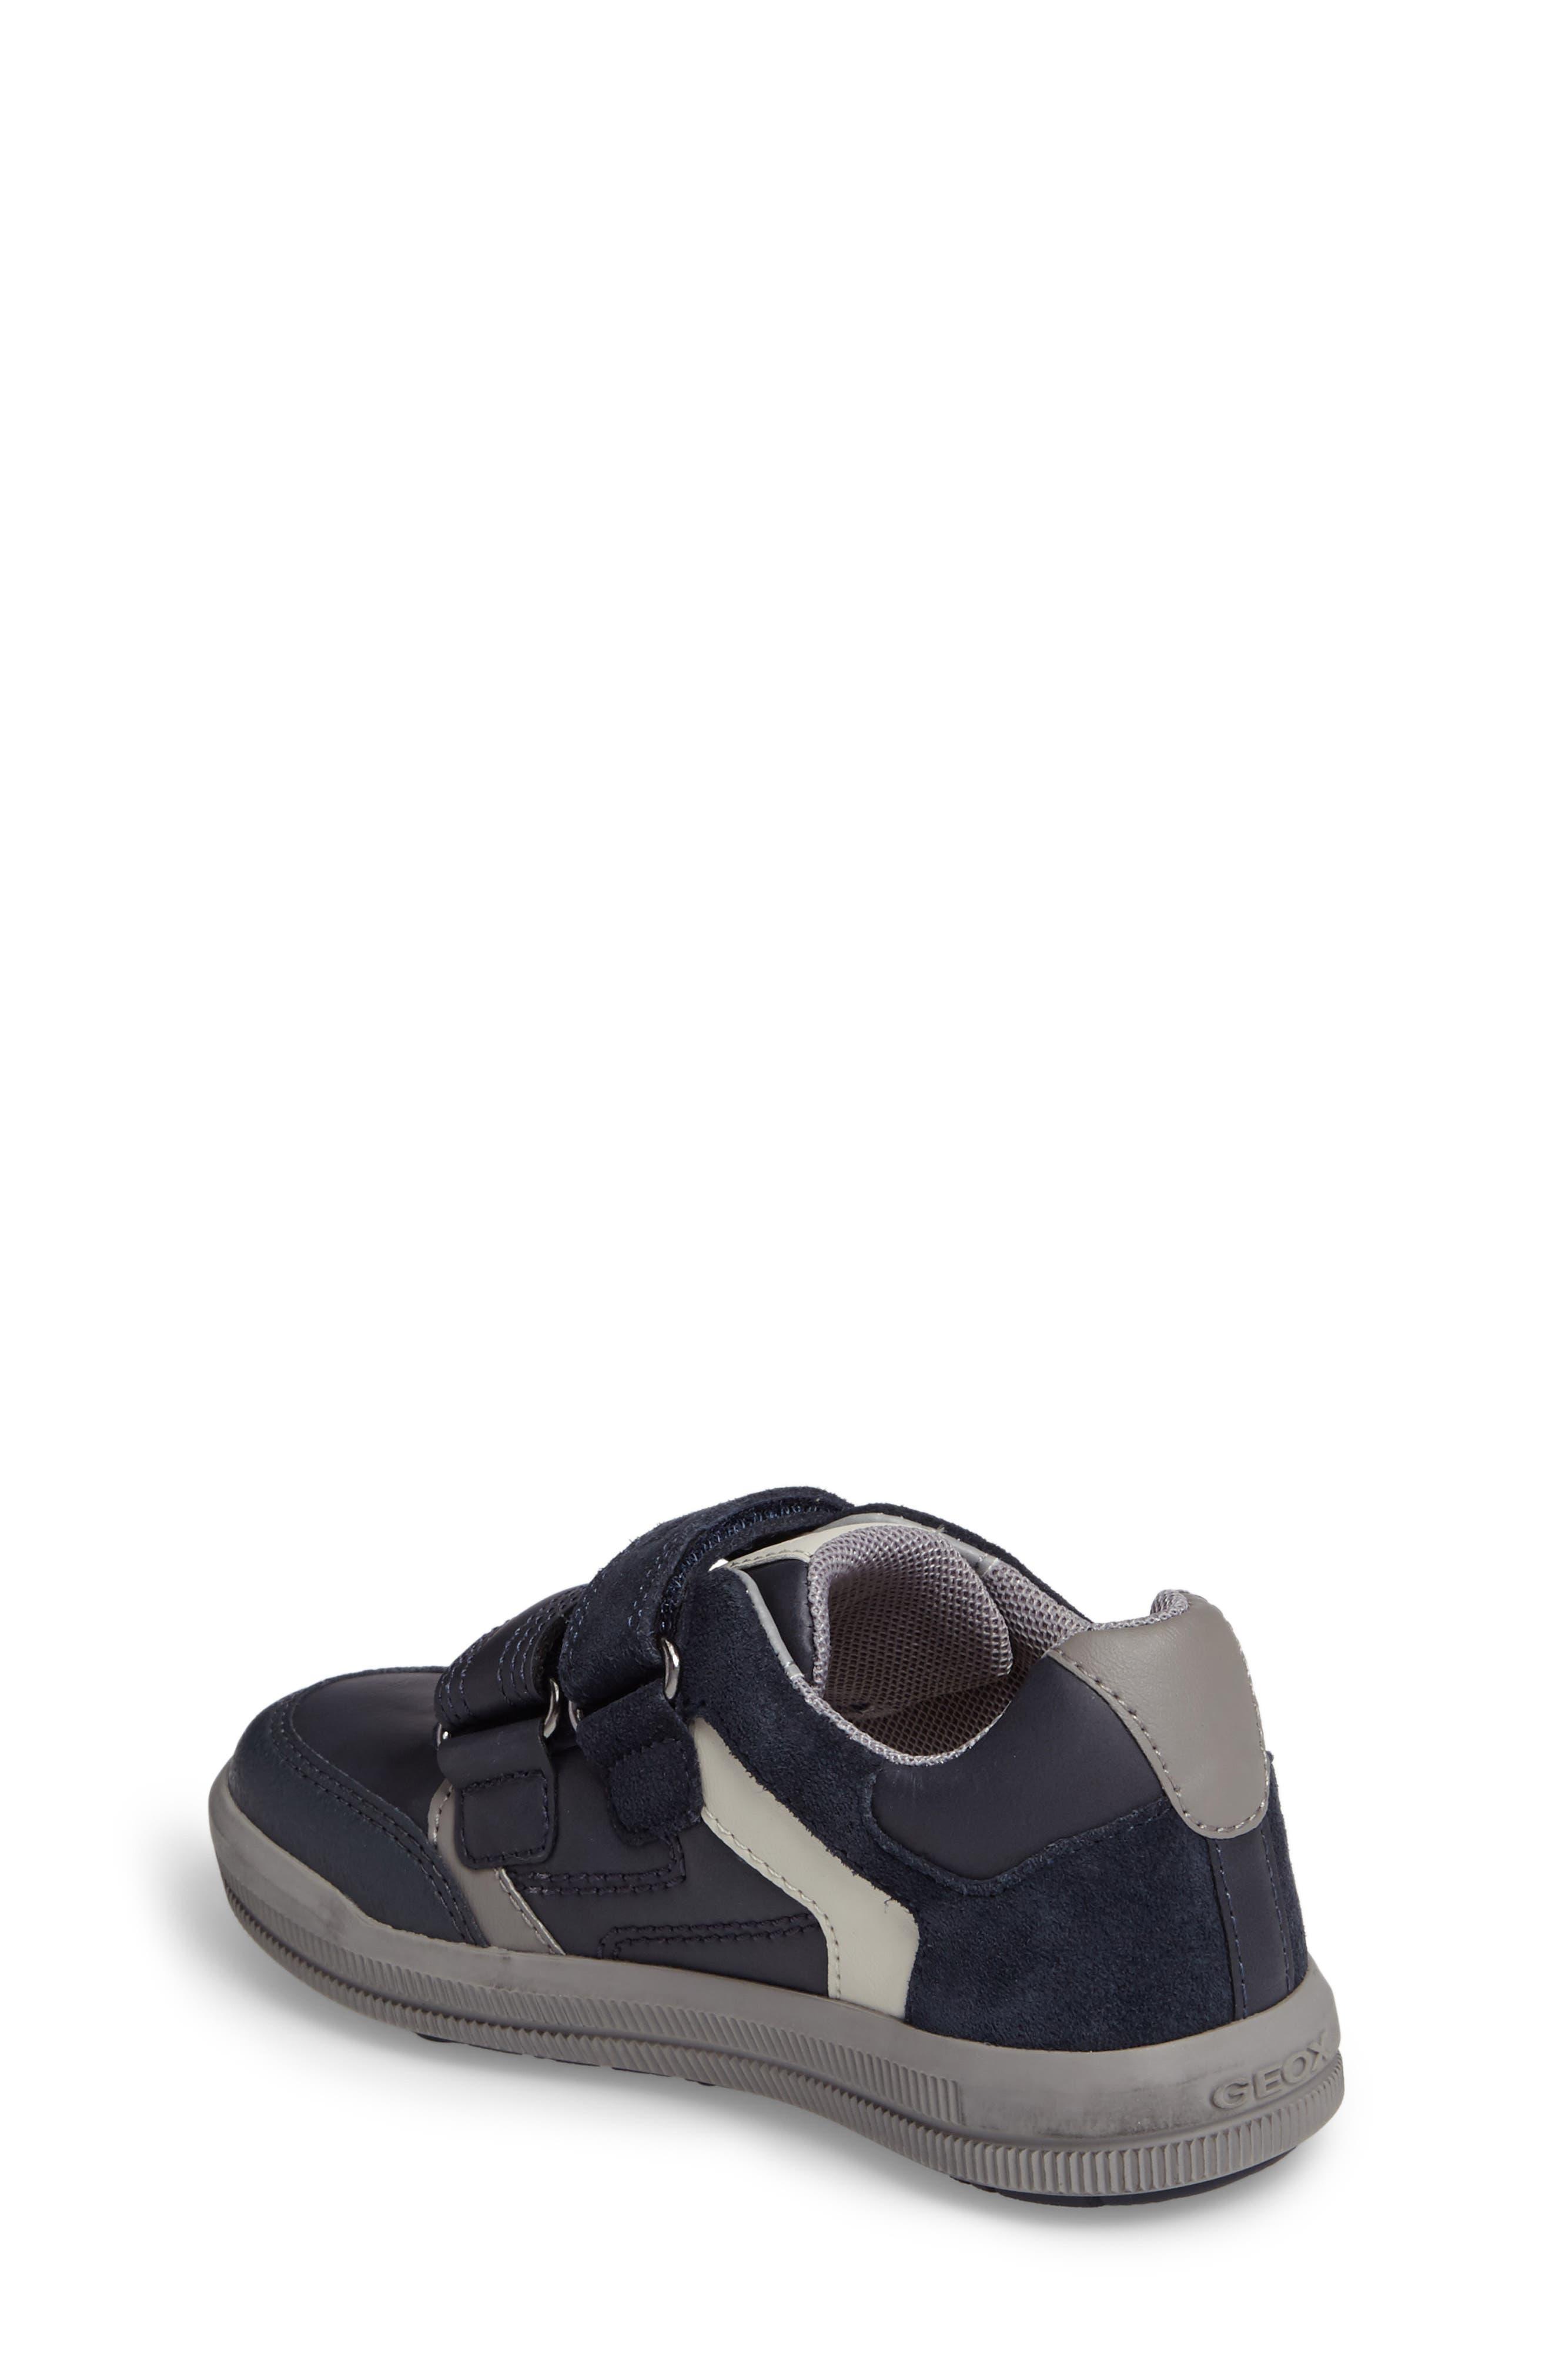 Alternate Image 2  - Geox Jr Arzach Sneaker (Toddler, Little Kid & Big Kid)